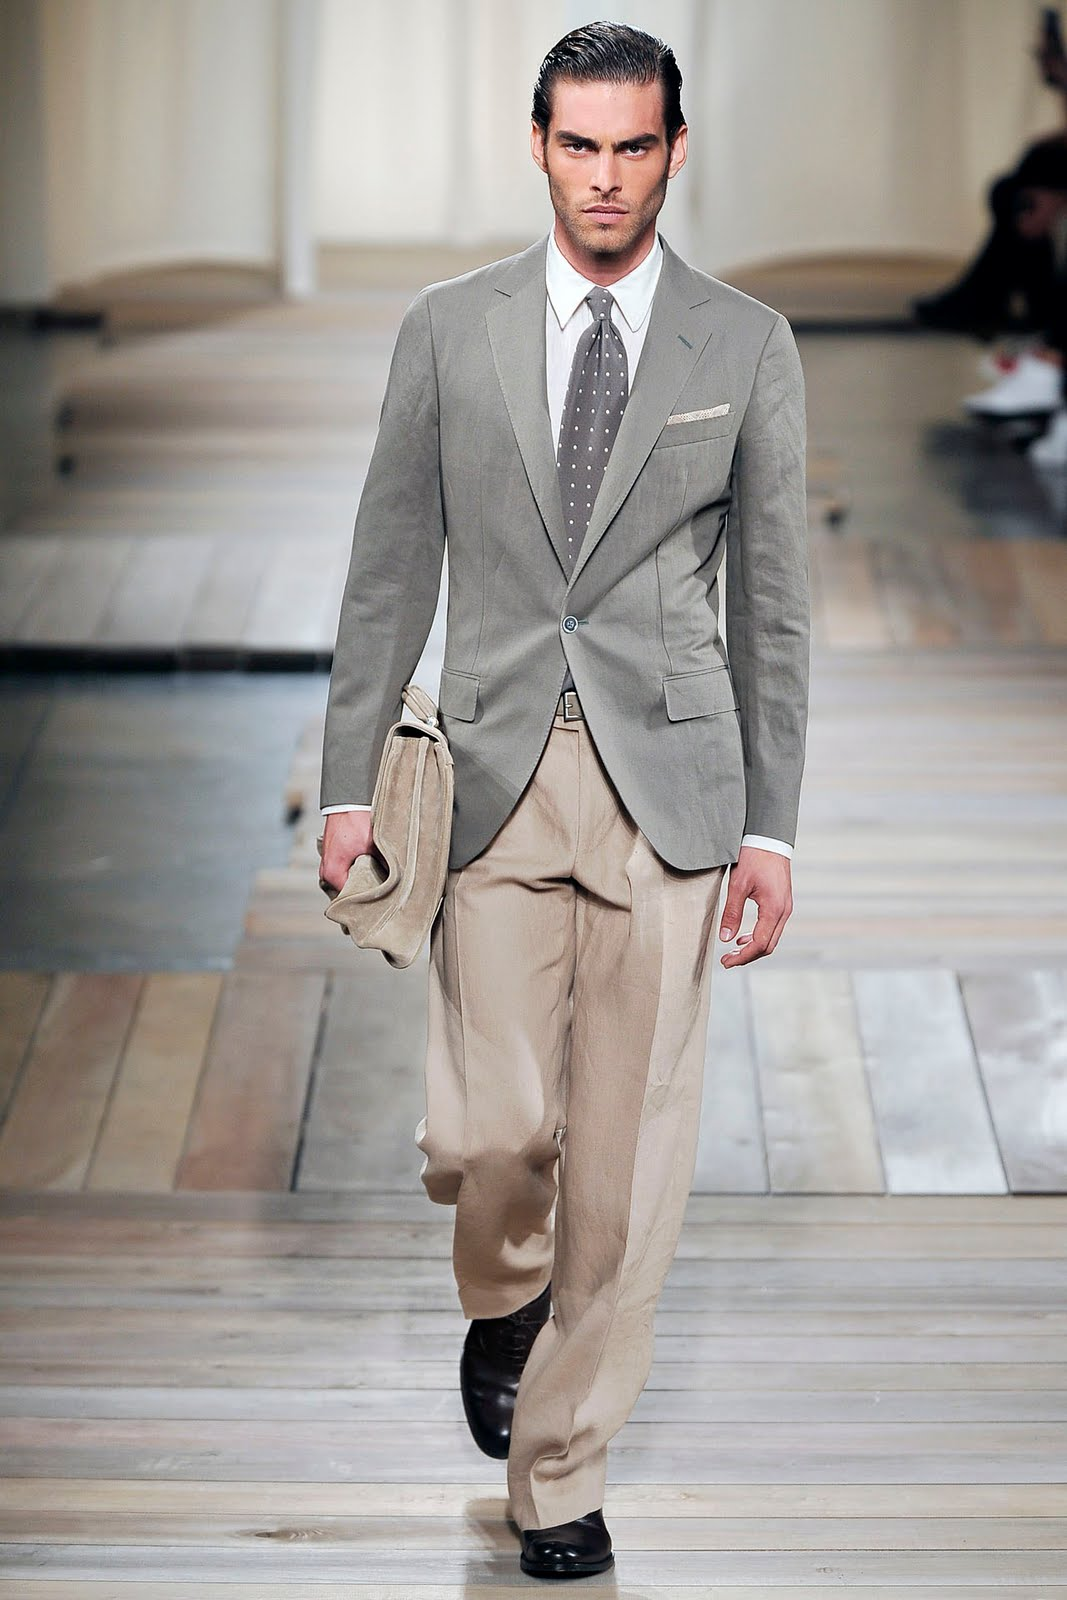 What To Wear Grey Blazer White Button Up Shirt Grey Tie White